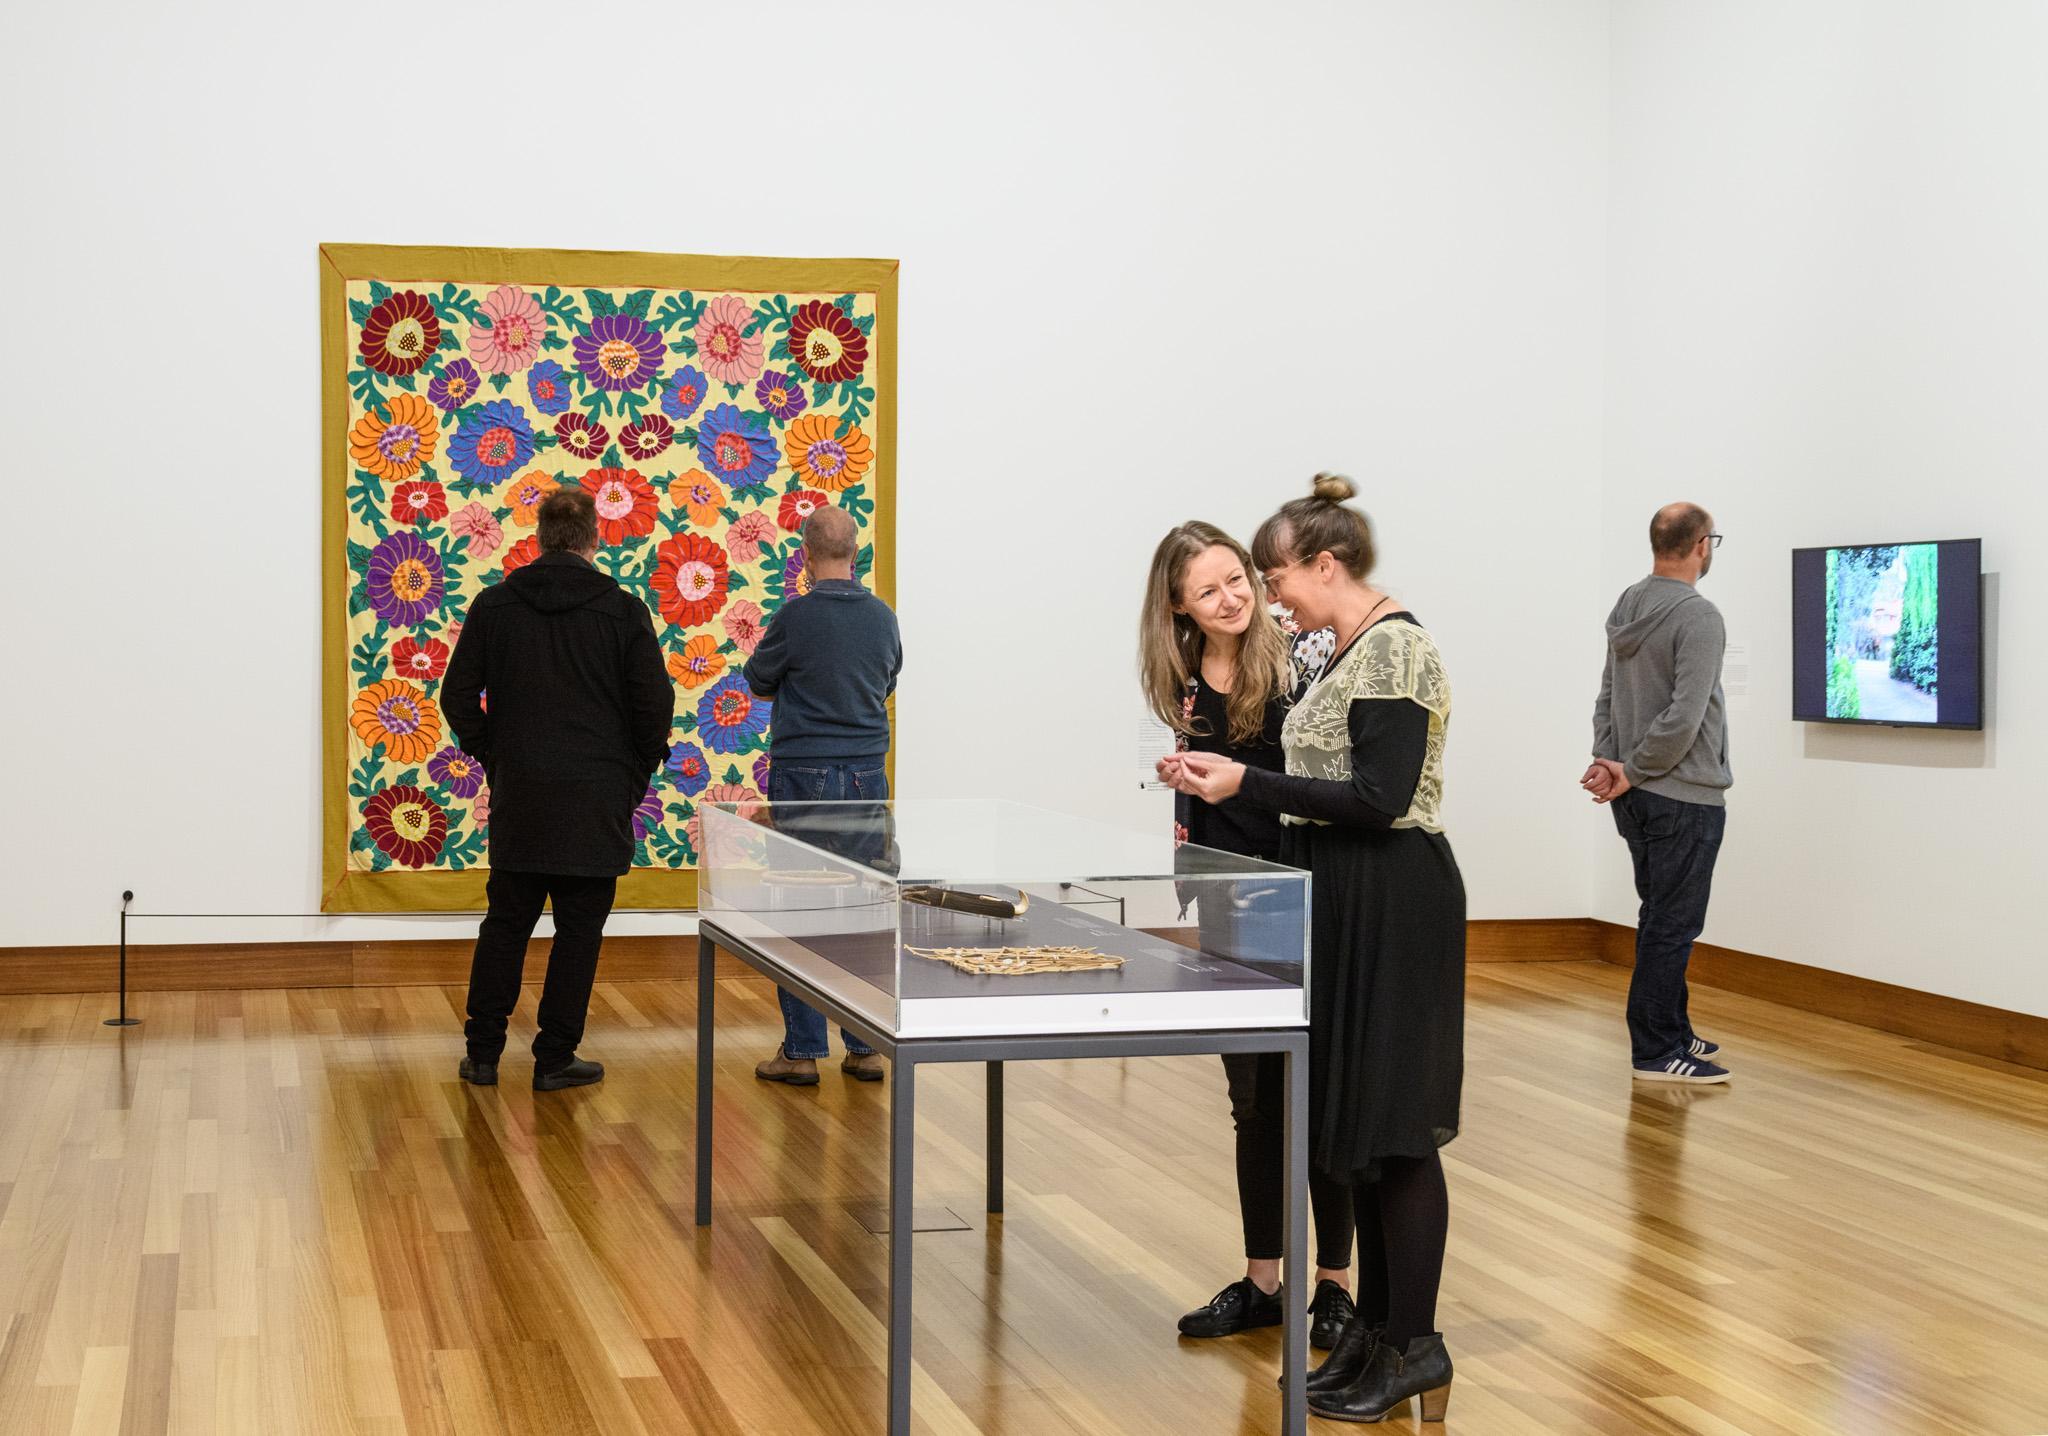 Christchurch Art Gallery Te Puna o Waiwhetū